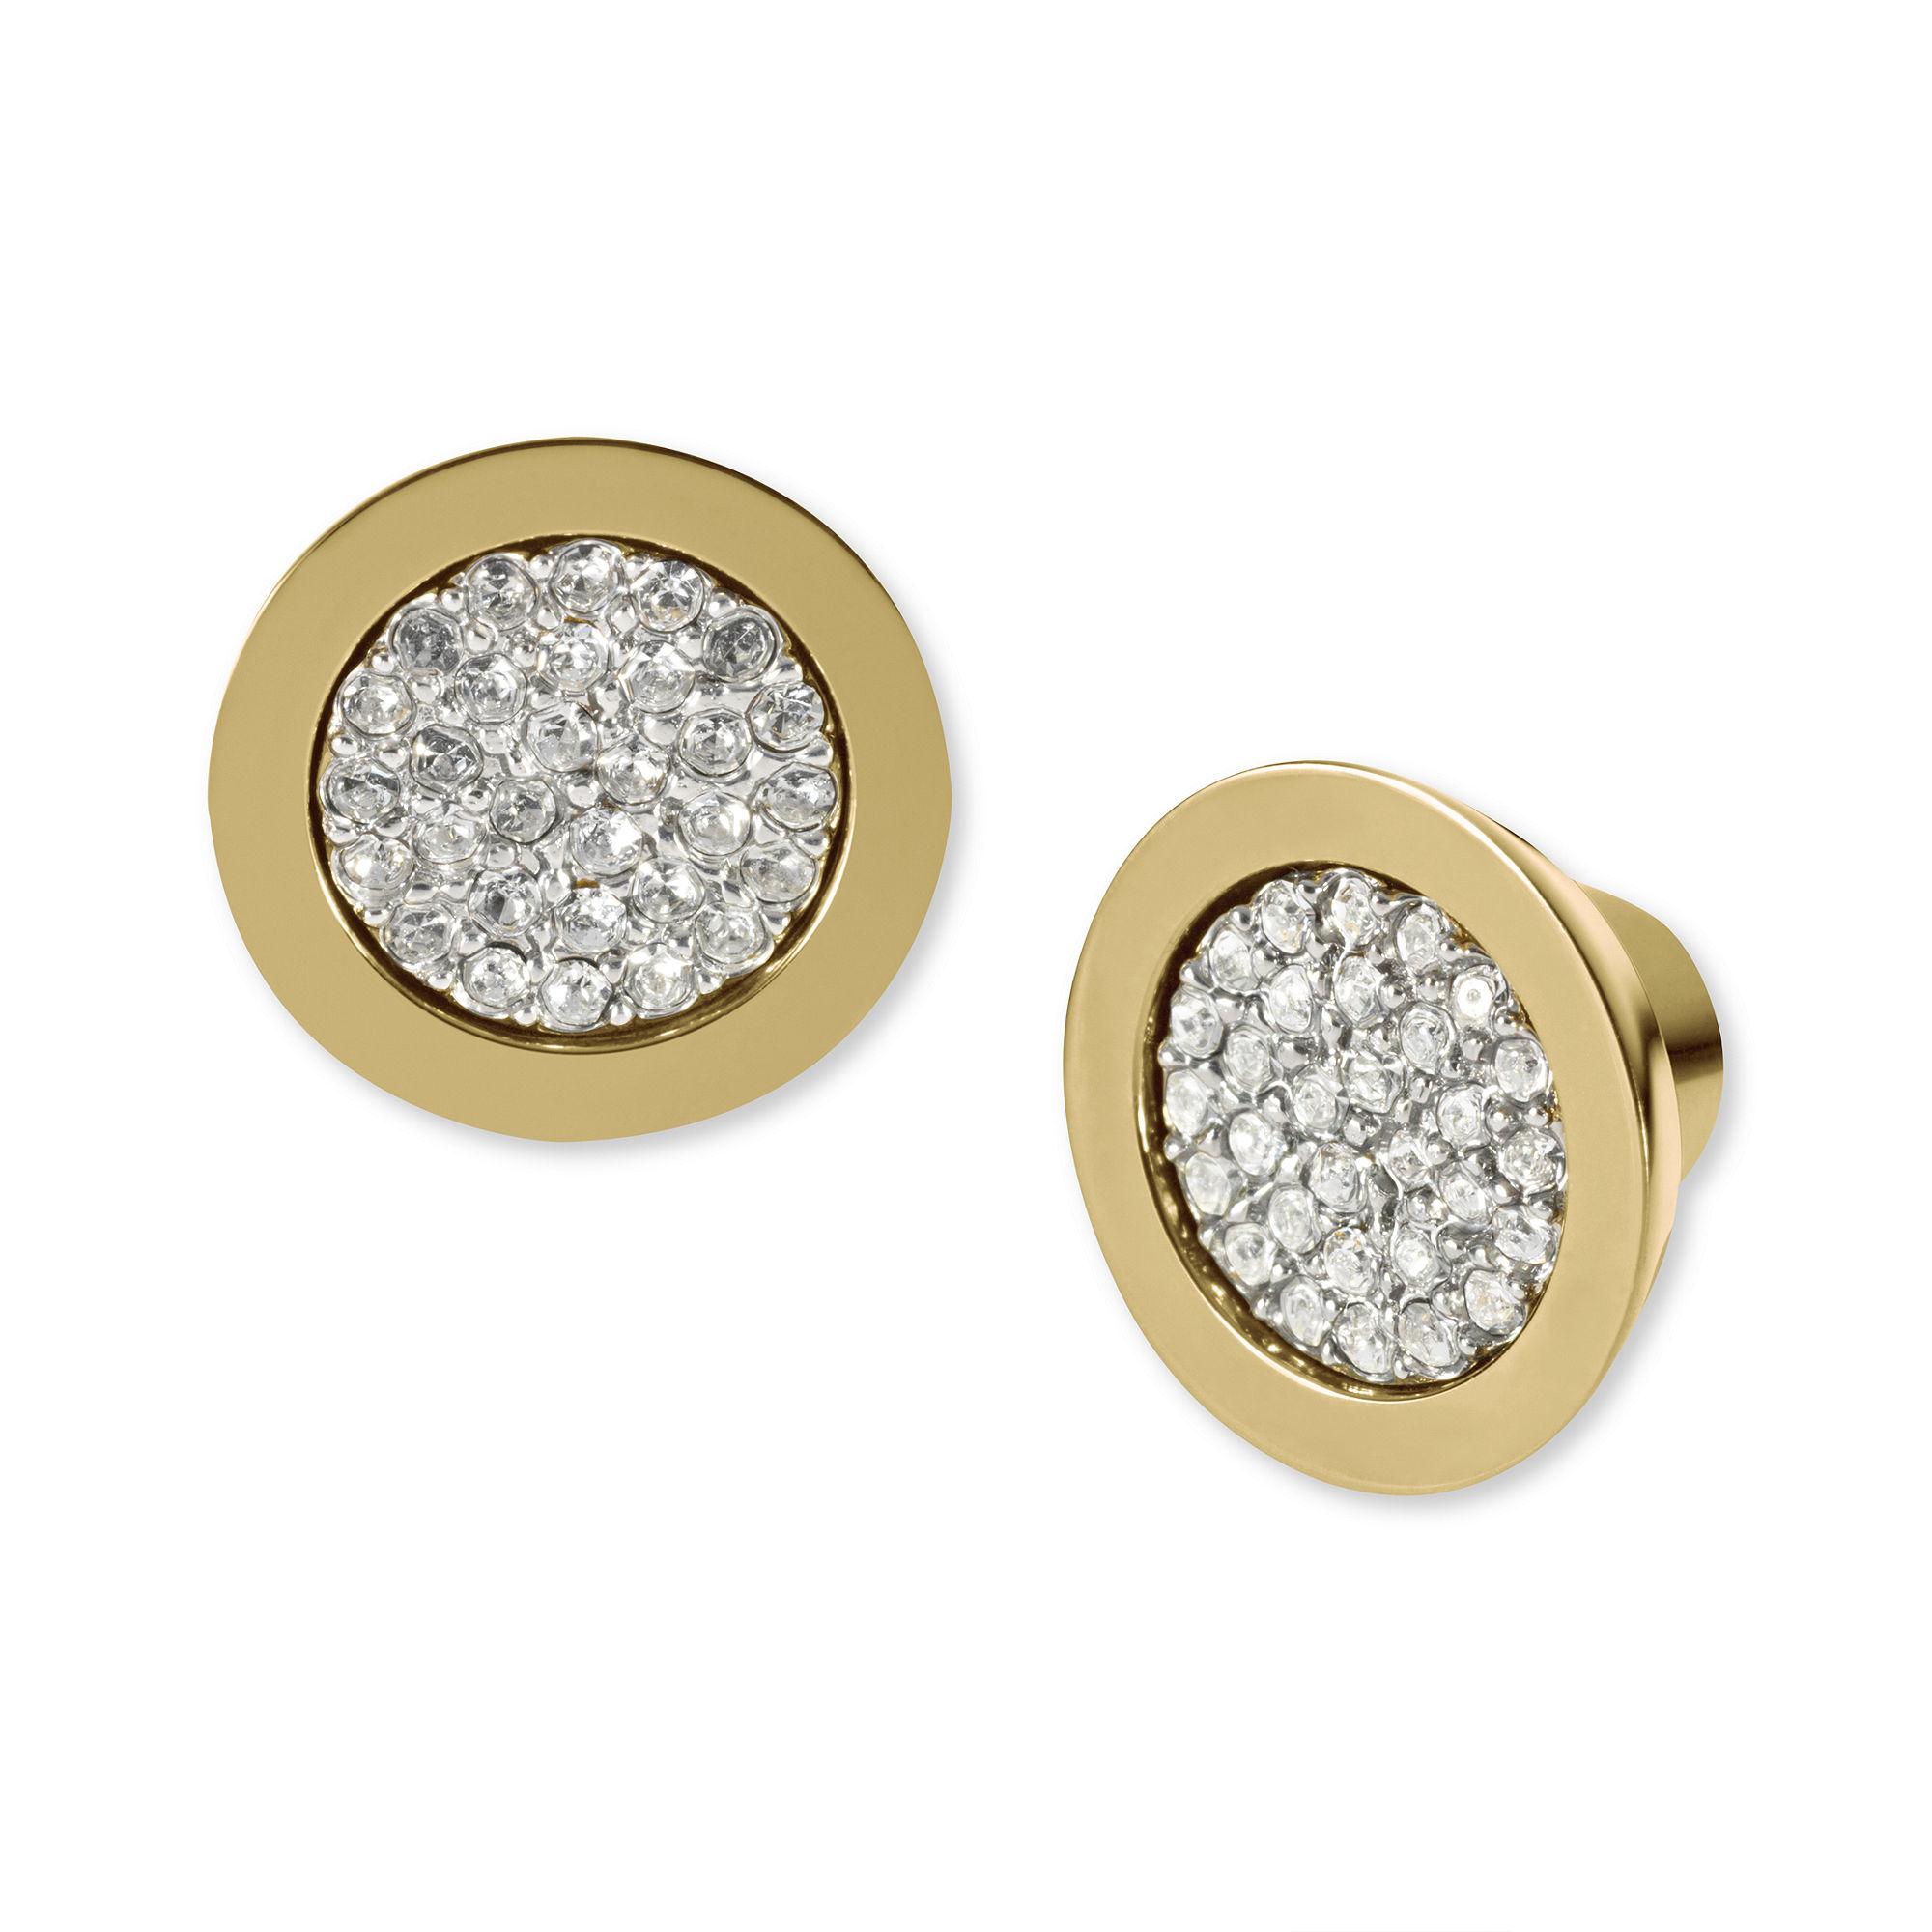 michael kors gold tone pave slice stud earrings in. Black Bedroom Furniture Sets. Home Design Ideas